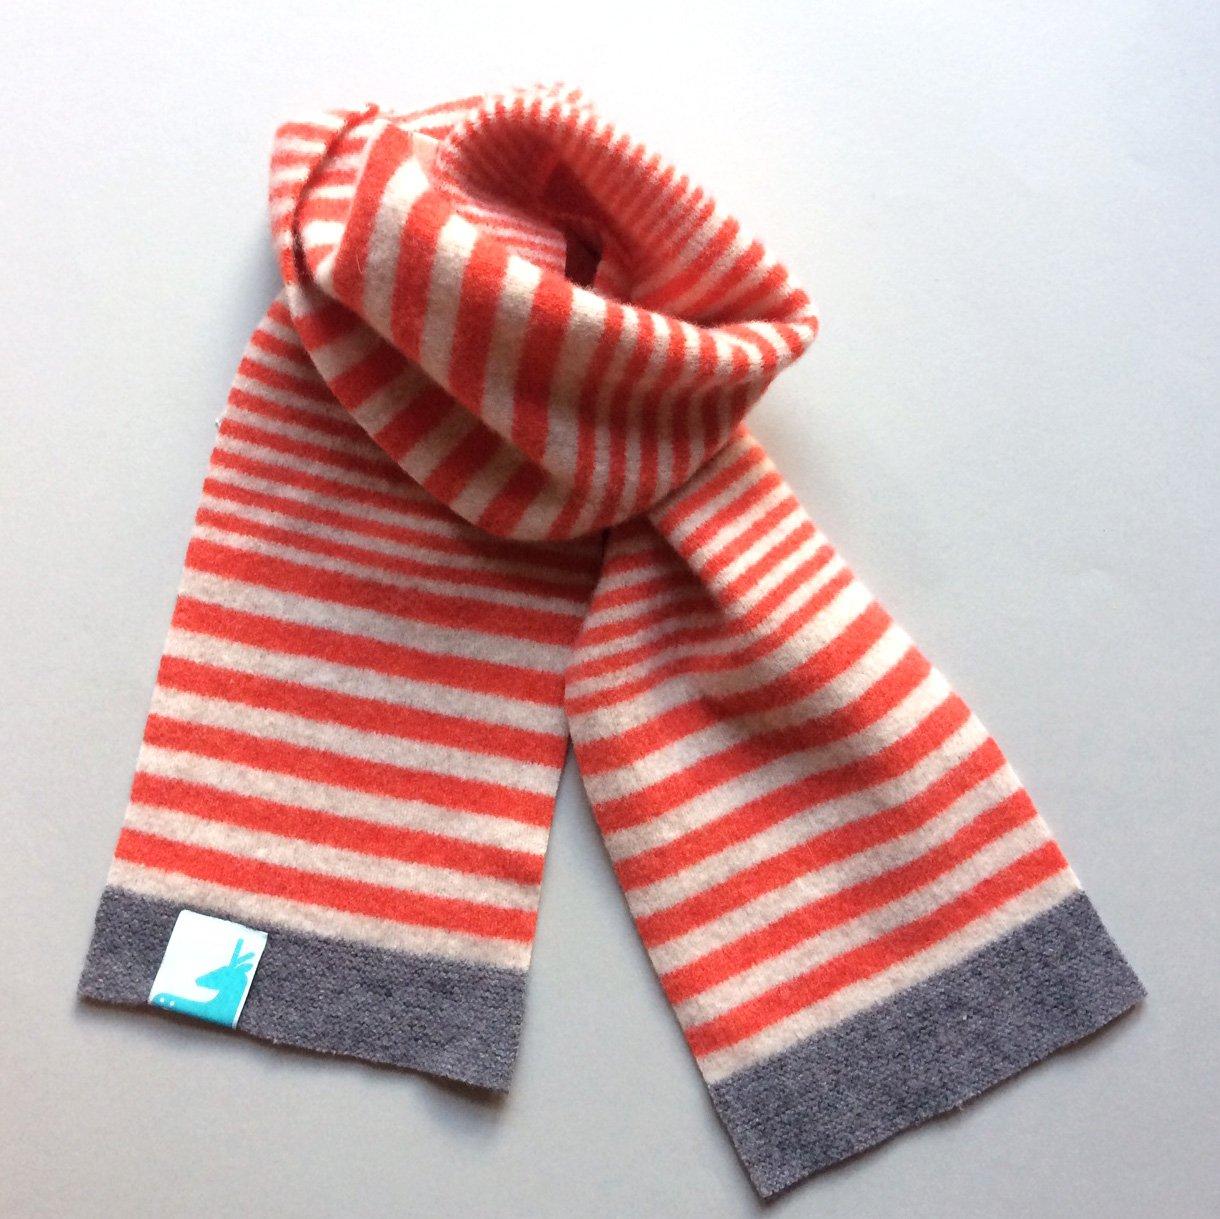 orange_scarf_wrap_ca31ad9c-8e9f-4b99-b1fb-fc89355db249_1024x1024@2x.jpg